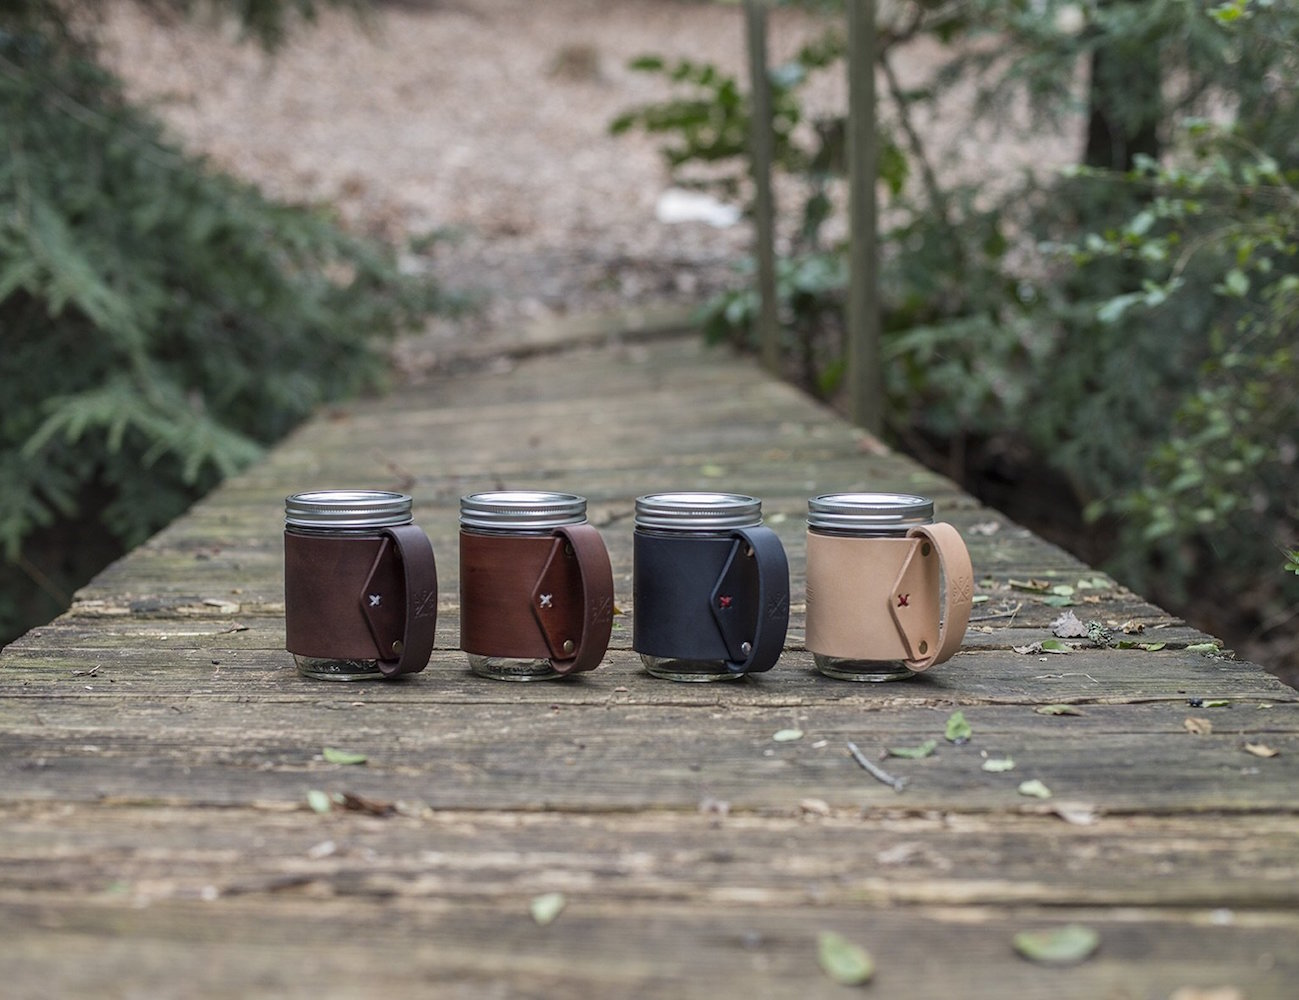 The Traveler Mug – Mason Jar Hugged in Vegetable Tanned Leather